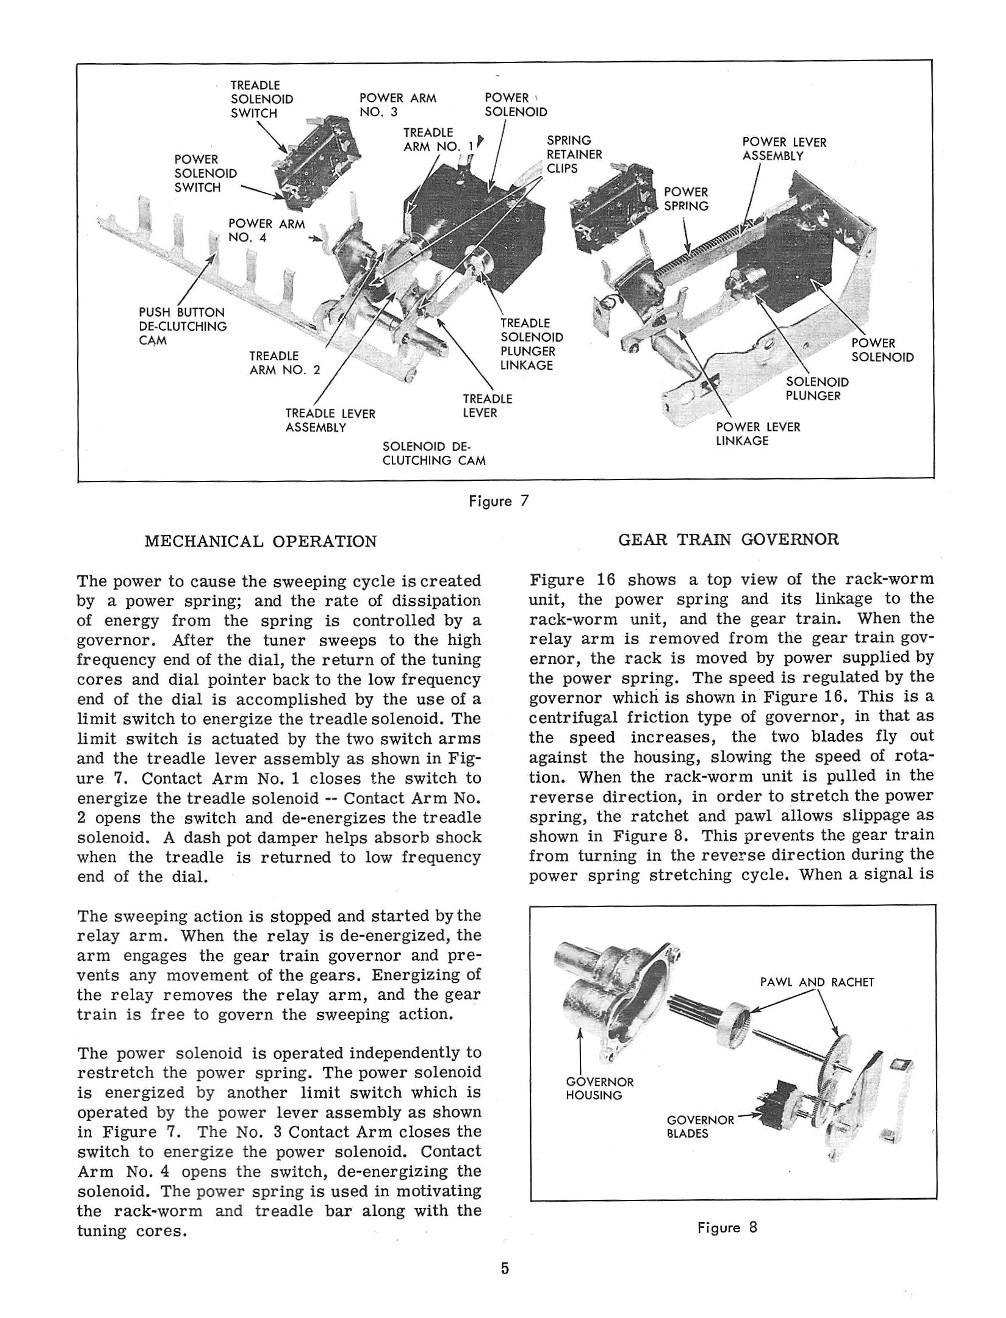 1960 Chevrolet Radio Service and Shop Manual